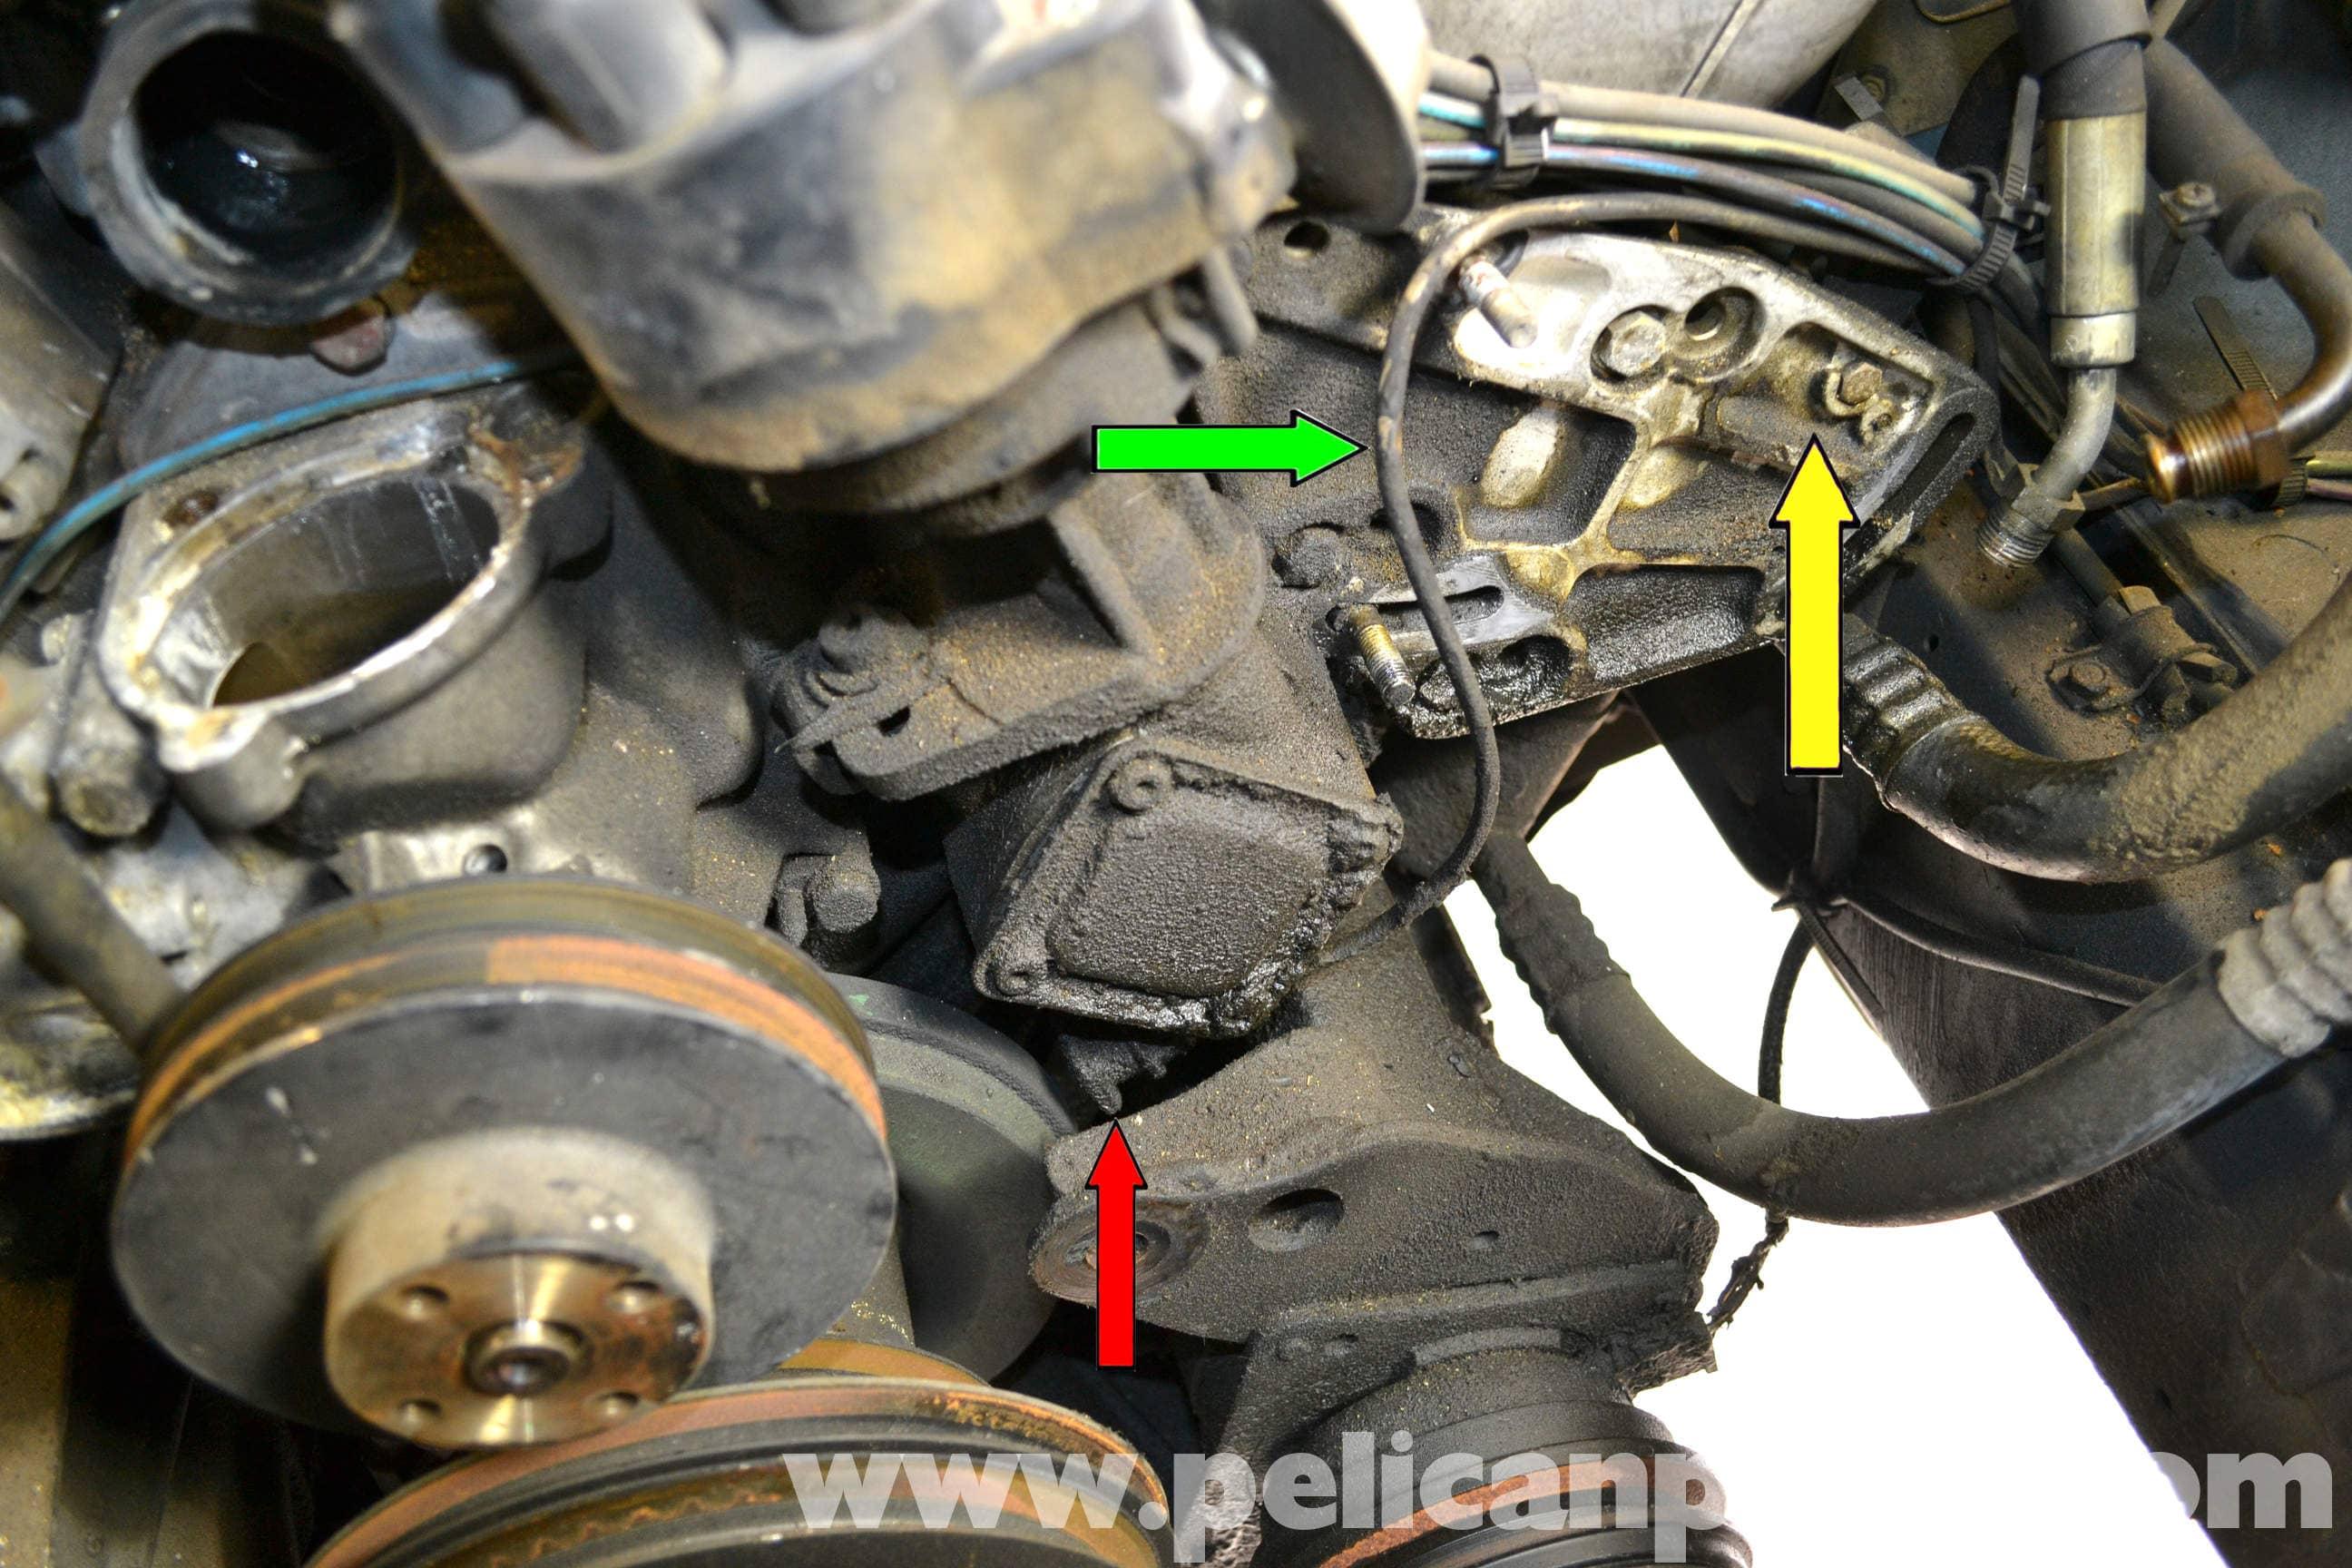 2003 Honda Rancher Wiring Diagram Mercedes Benz W126 Top Dead Center Sensor Replacement